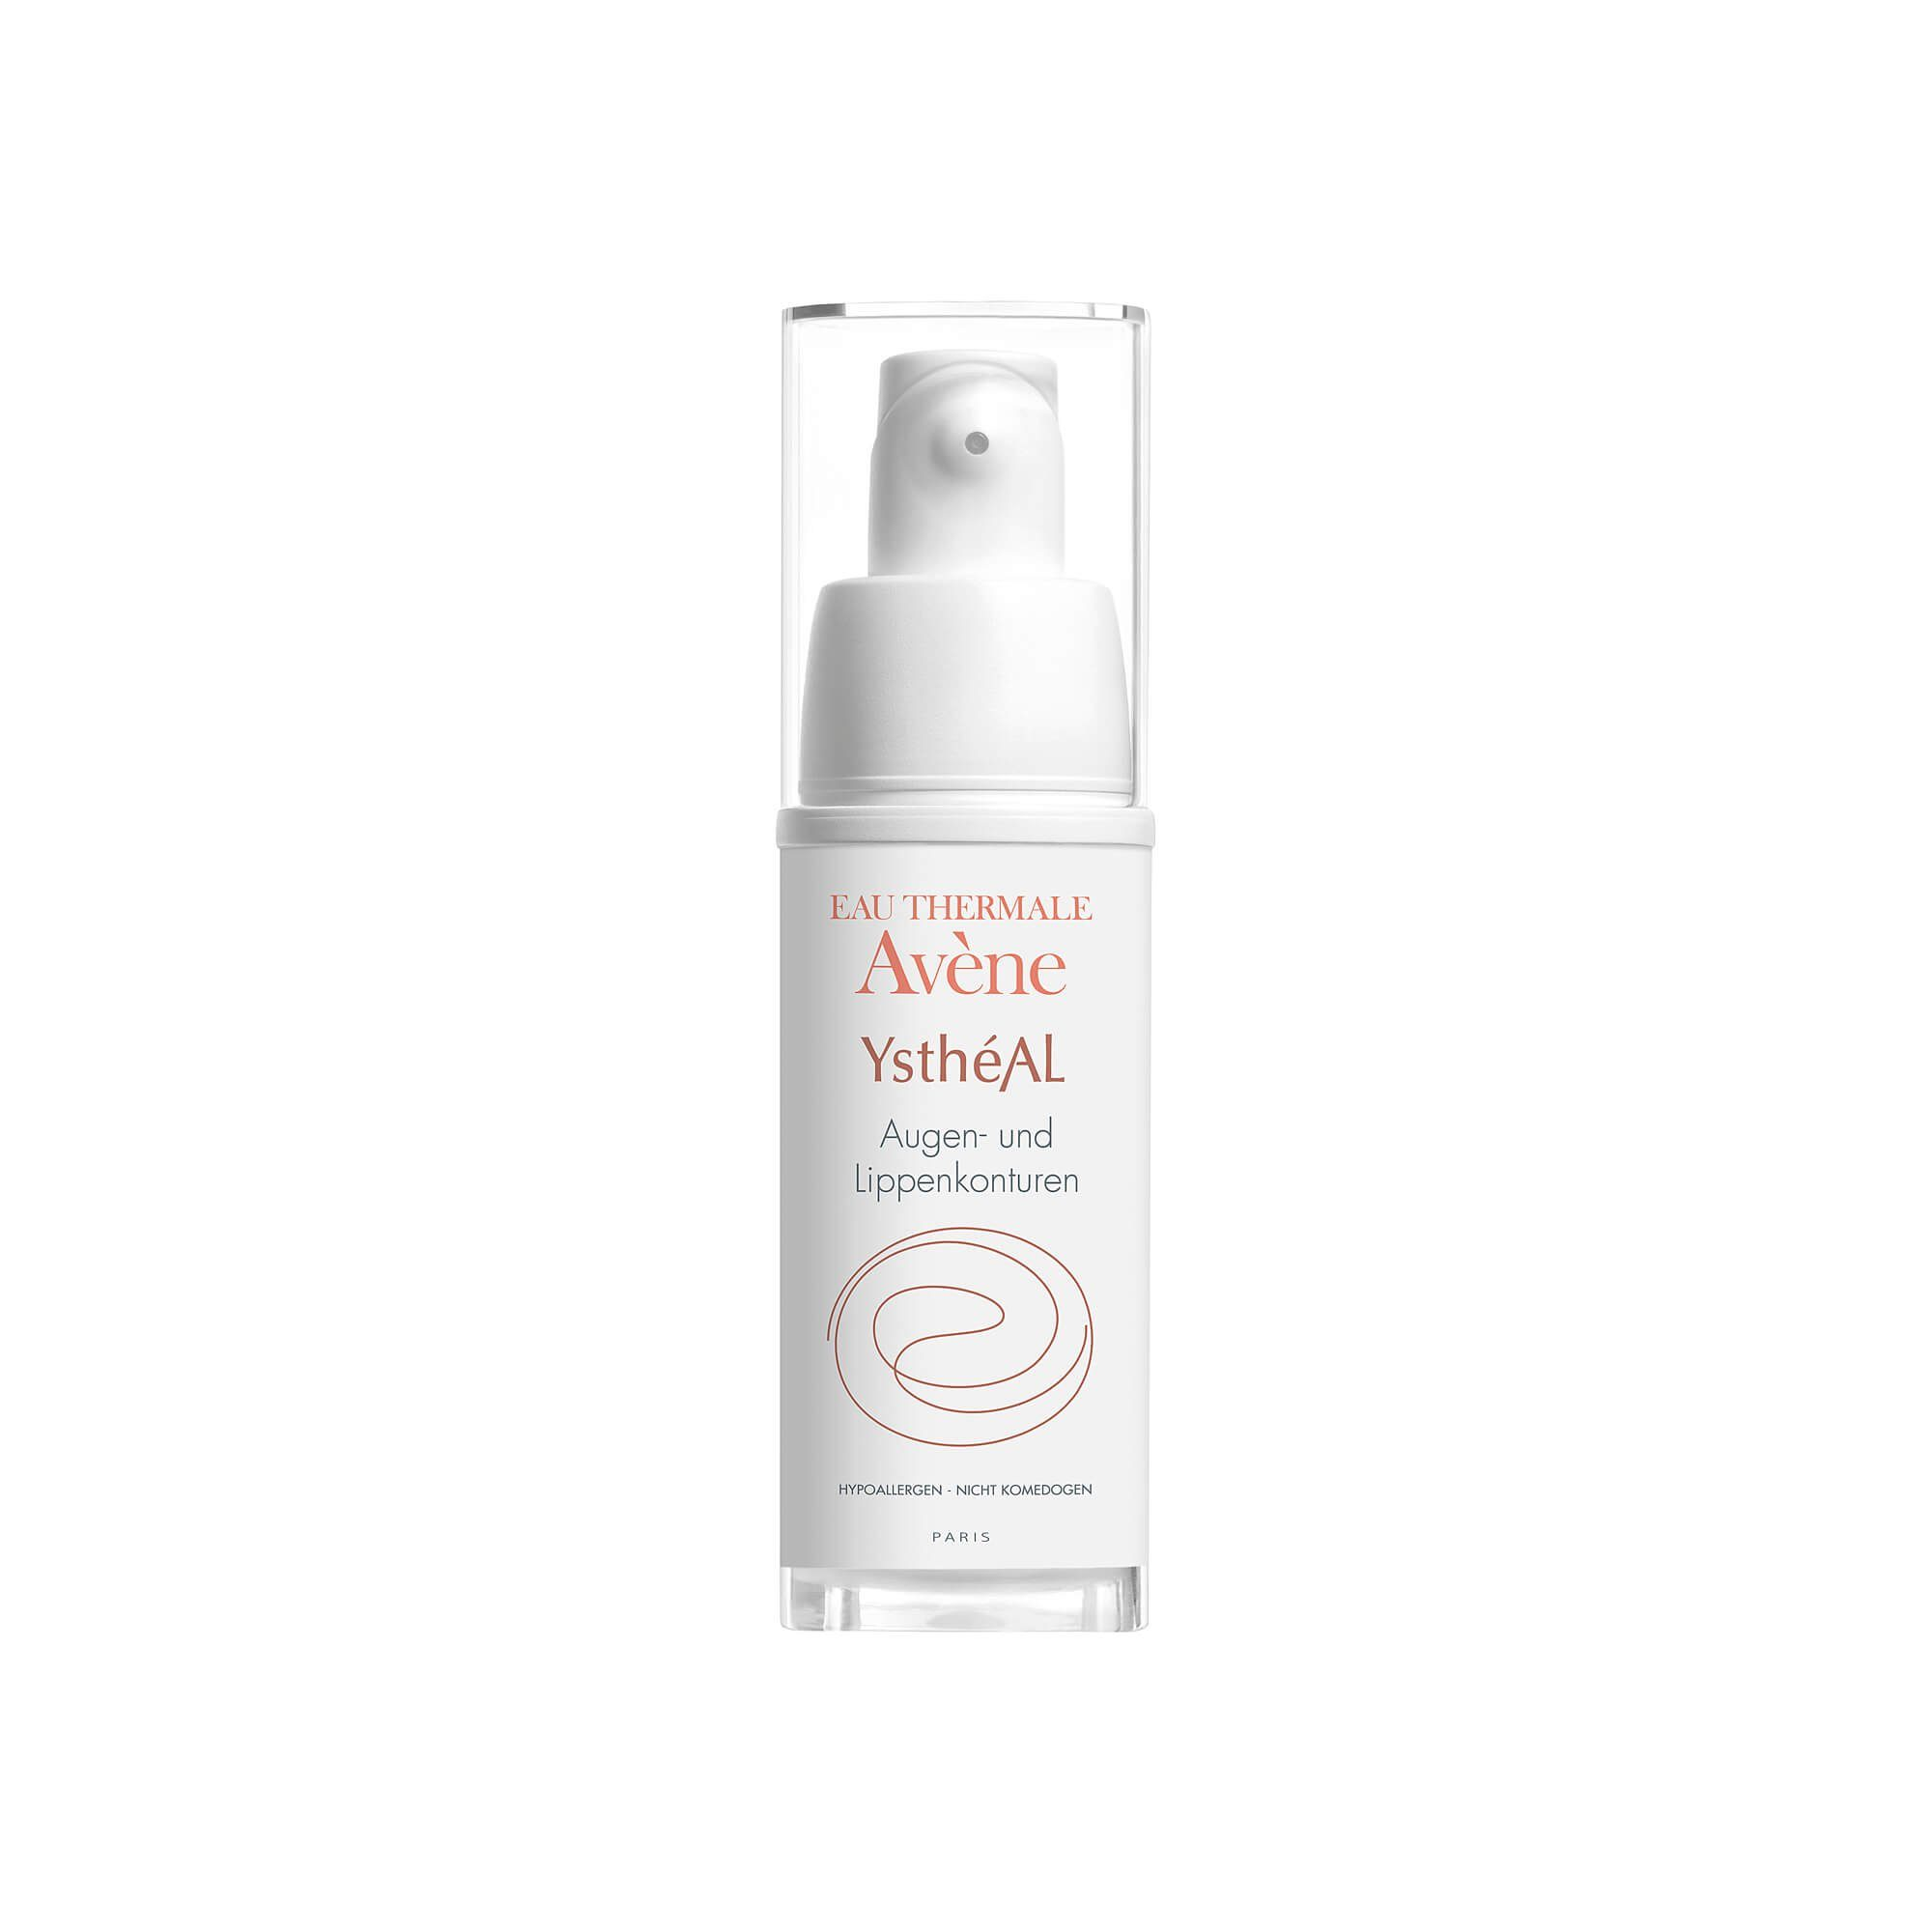 Avene Avene Ystheal Augen- und Lippenkonturen (, 15 ml)